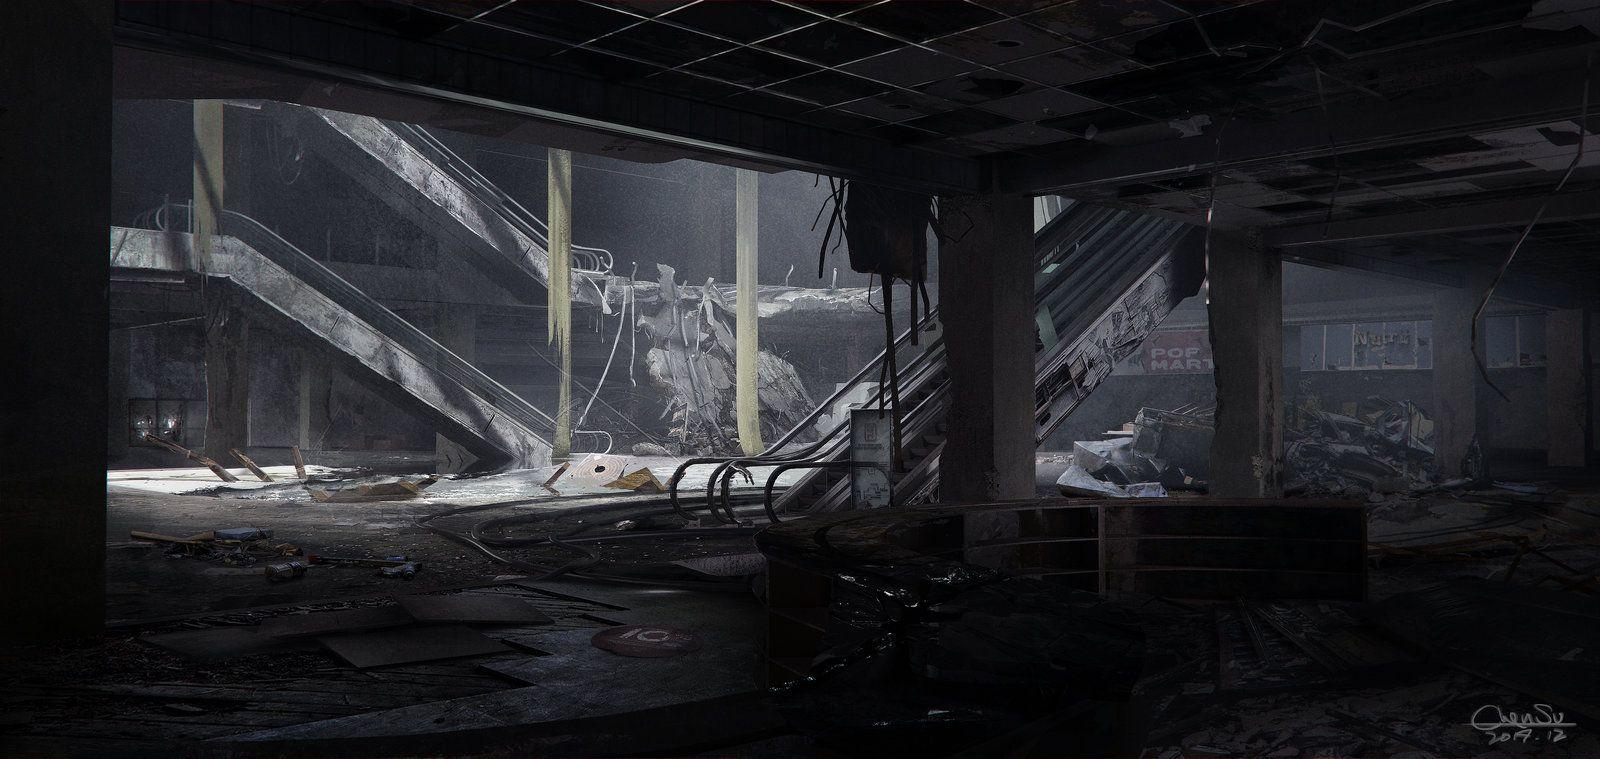 Abandoned Store, Su Chen on ArtStation at https://www.artstation.com/artwork/abandoned-store